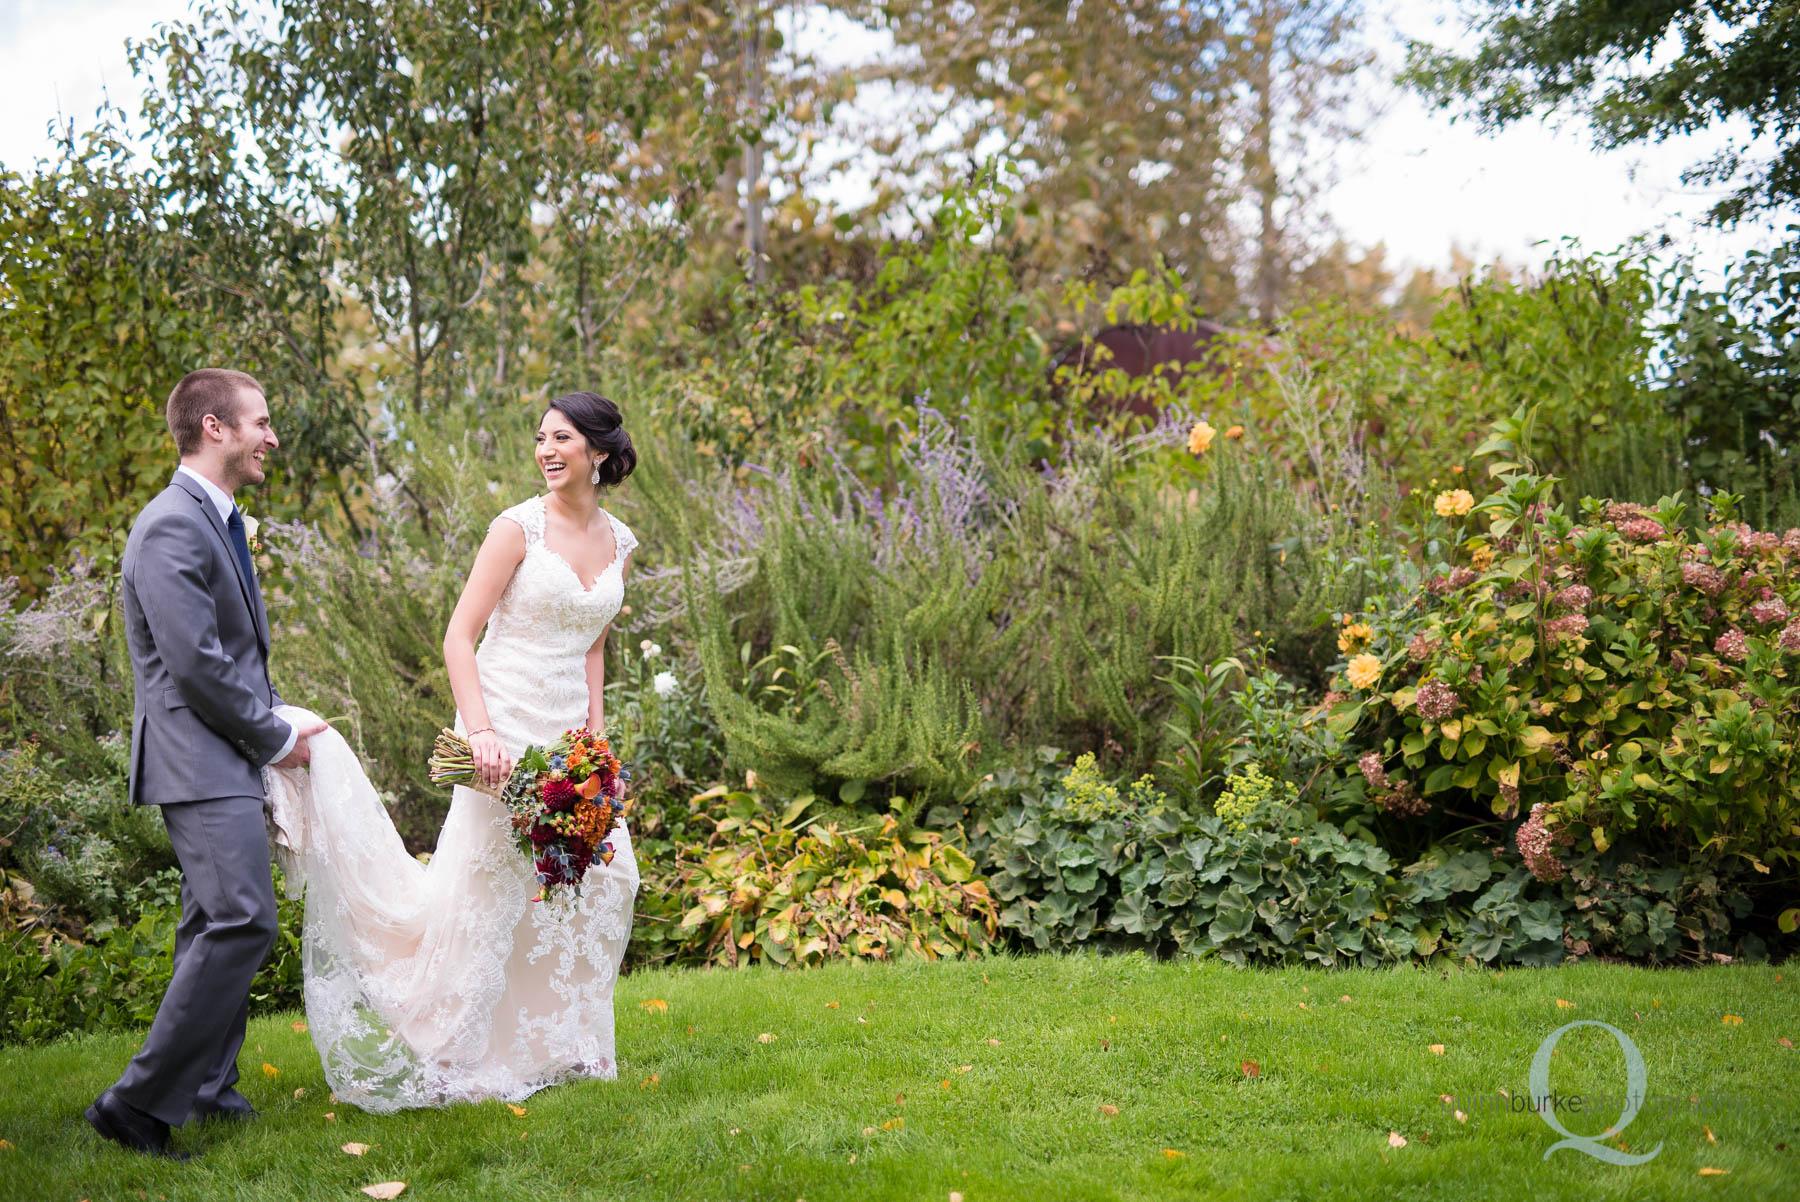 groom helping bride with dress in garden at Green Villa Barn